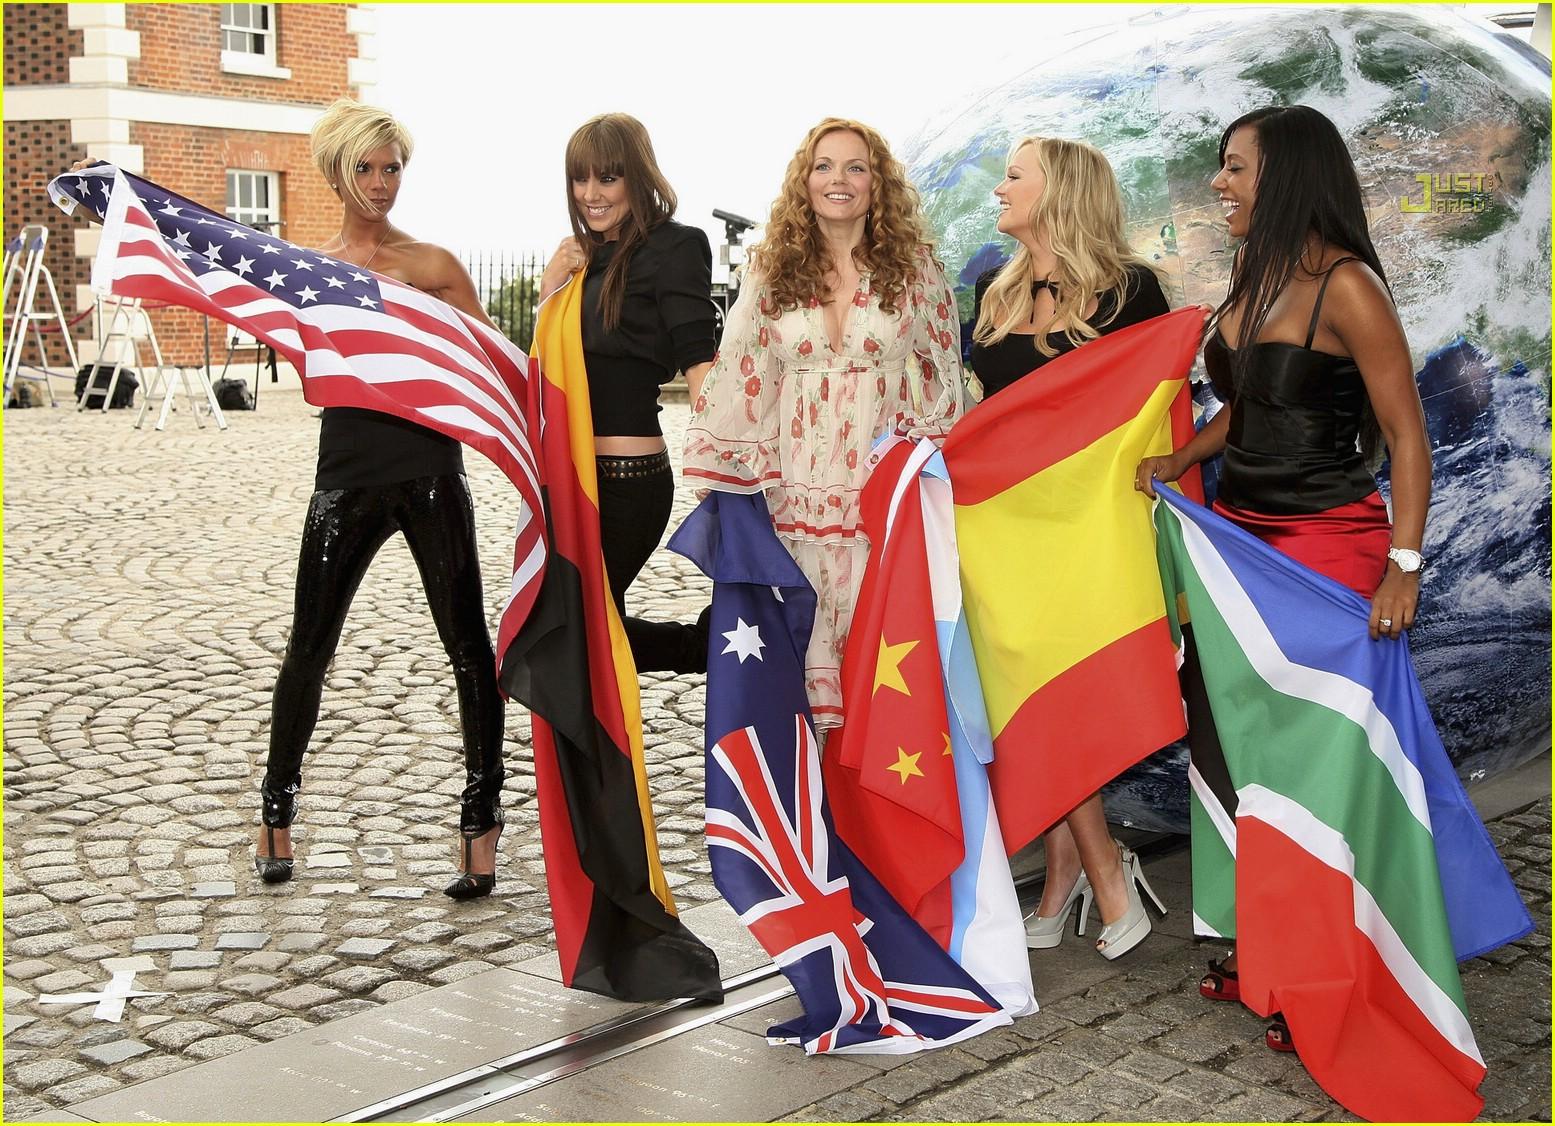 Mean girls the reunion release date in Australia